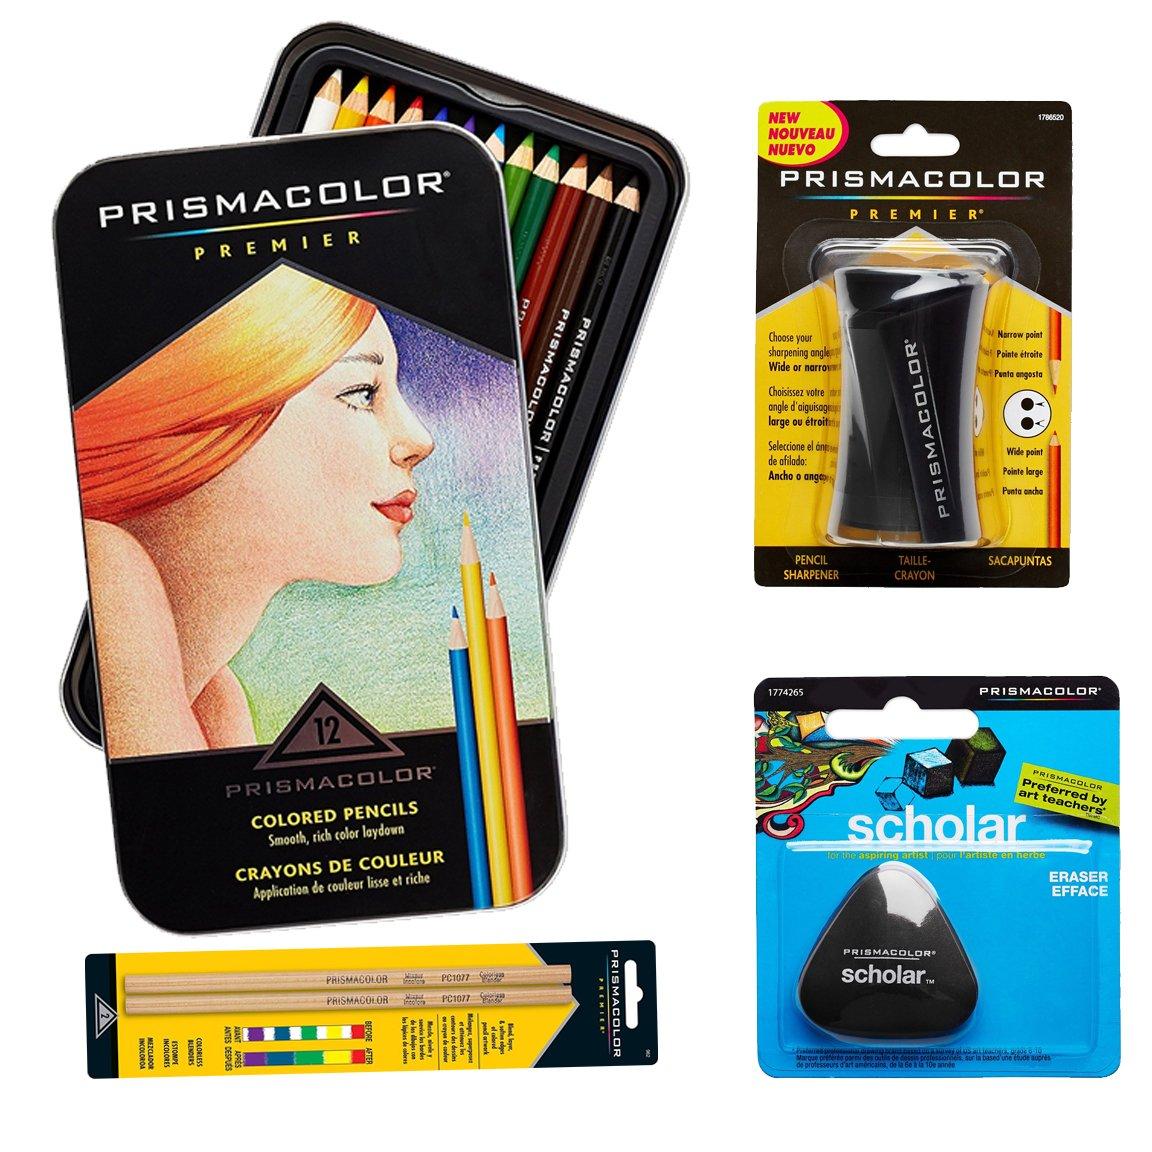 Prismacolor 12-Count Colored Pencils, Triangular Scholar Pencil Eraser, Premier Pencil Sharpener, and Colorless Blender Pencils